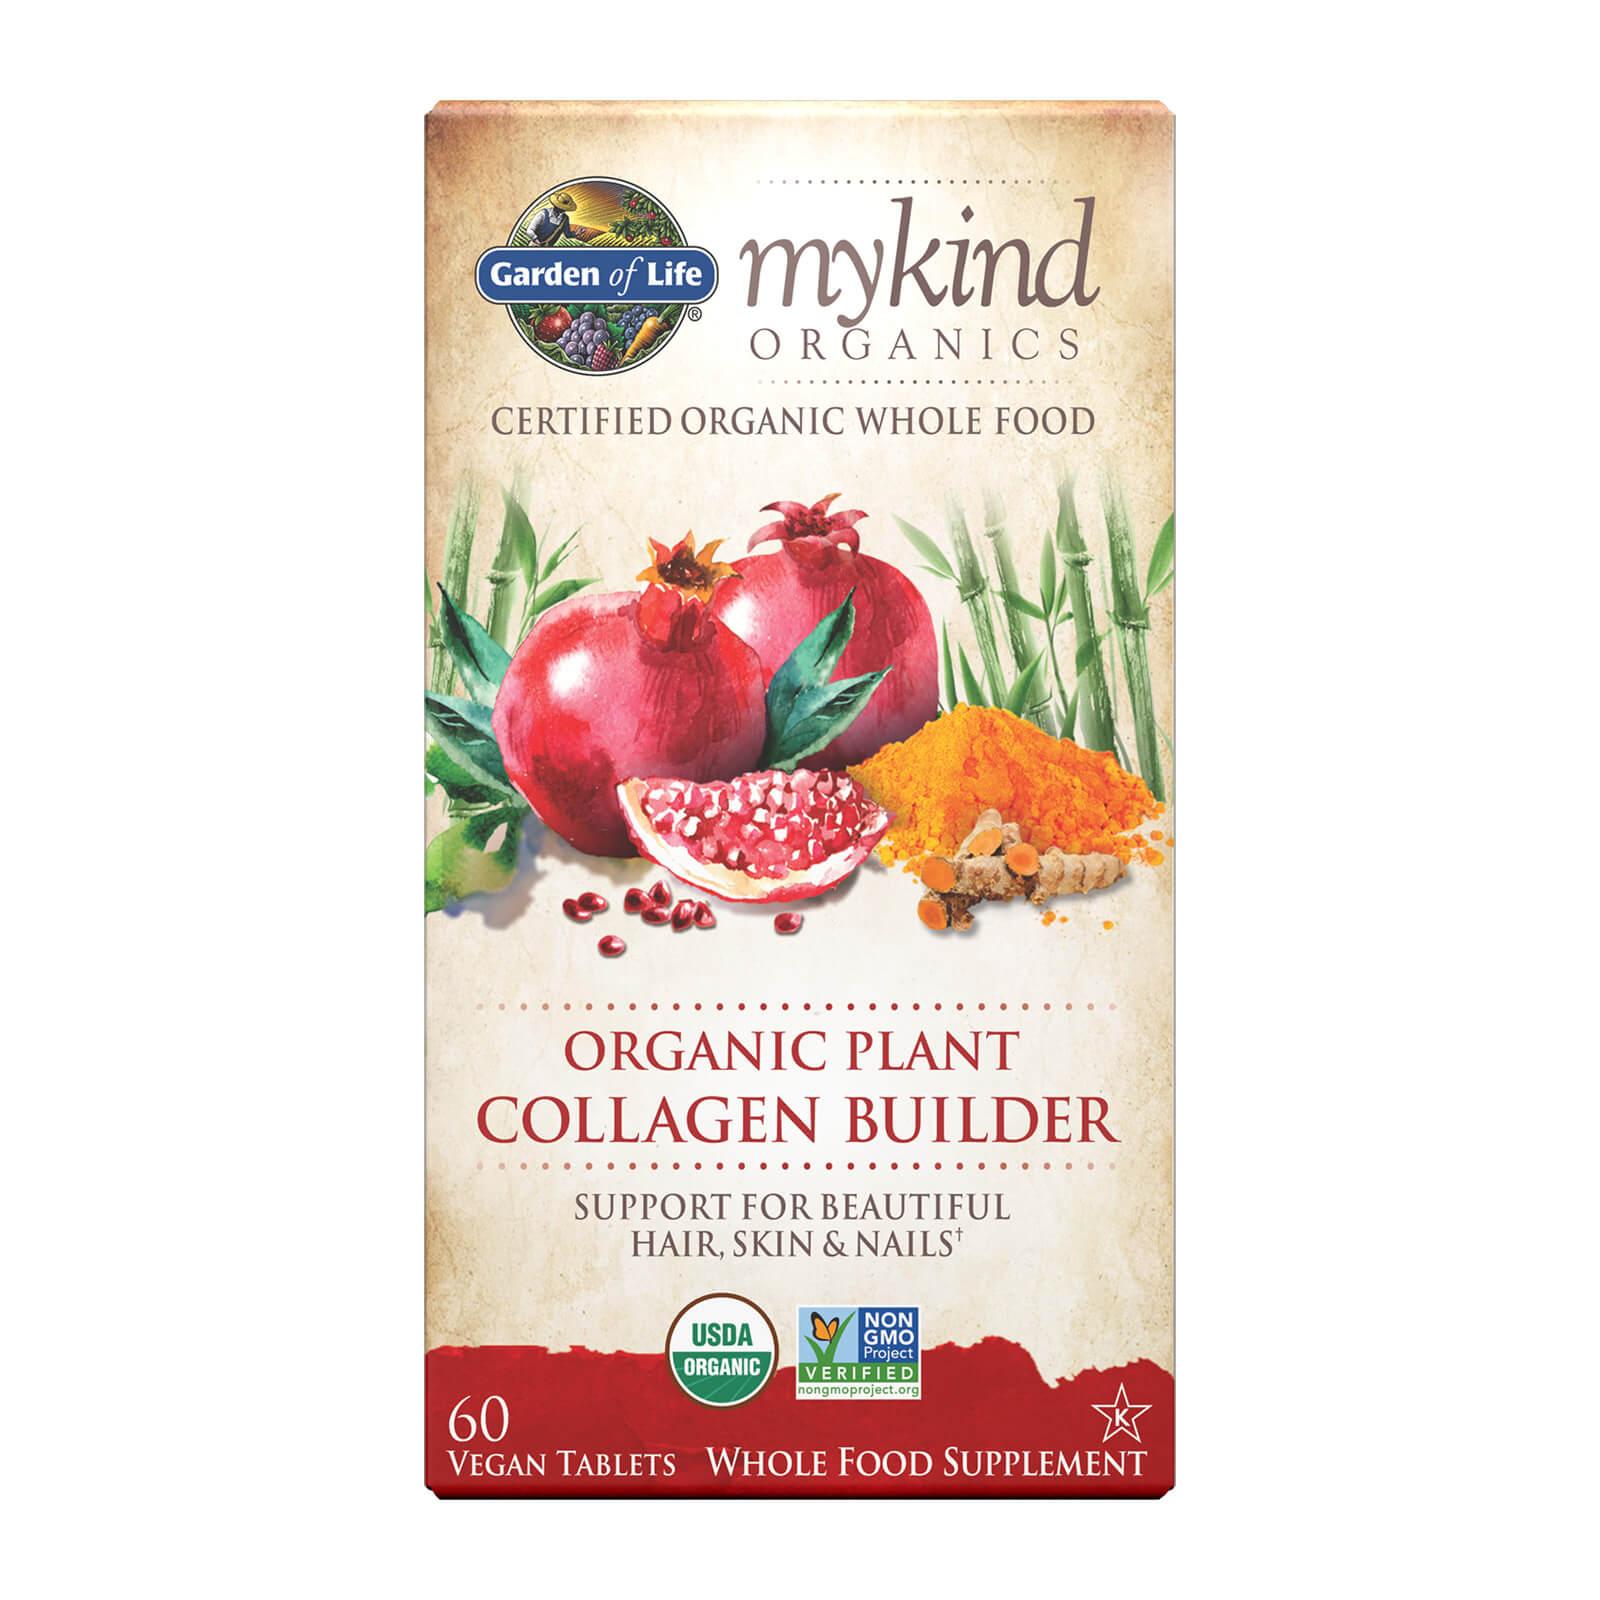 mykind Organics Plantaardig Collageen Opbouwer - 60 tabletten